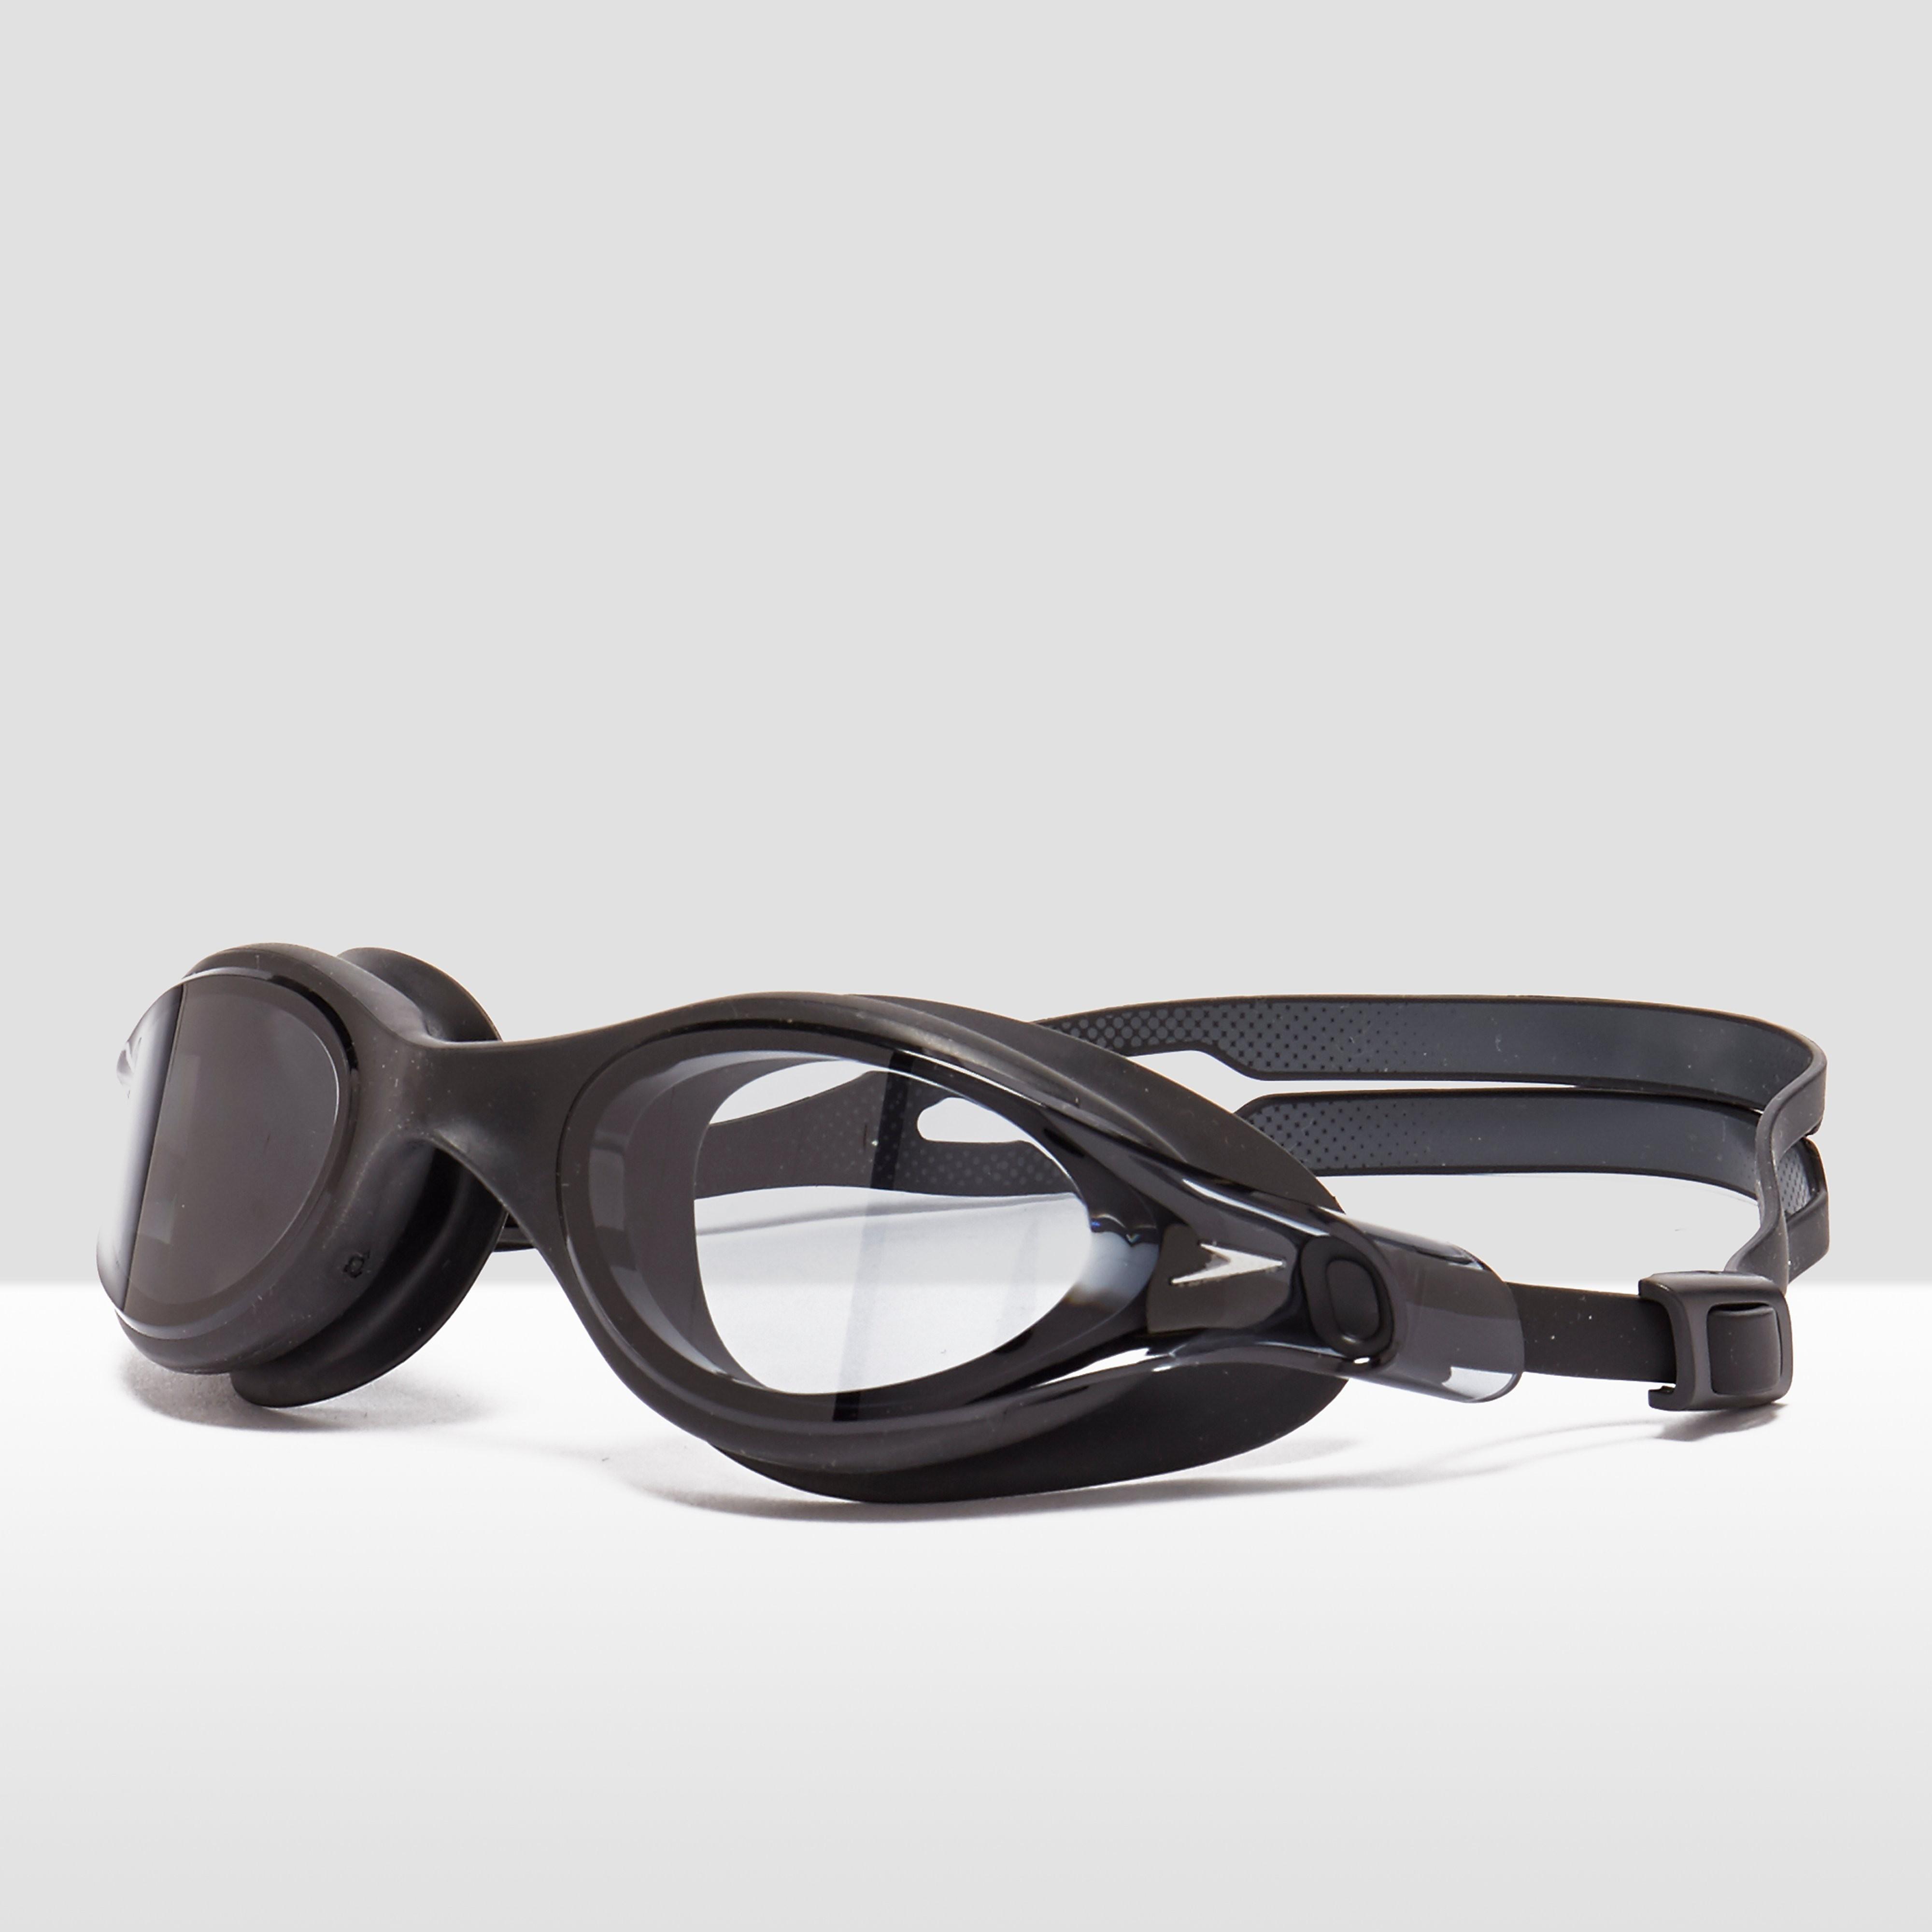 Speedo Unisex VUE Swimming Goggles